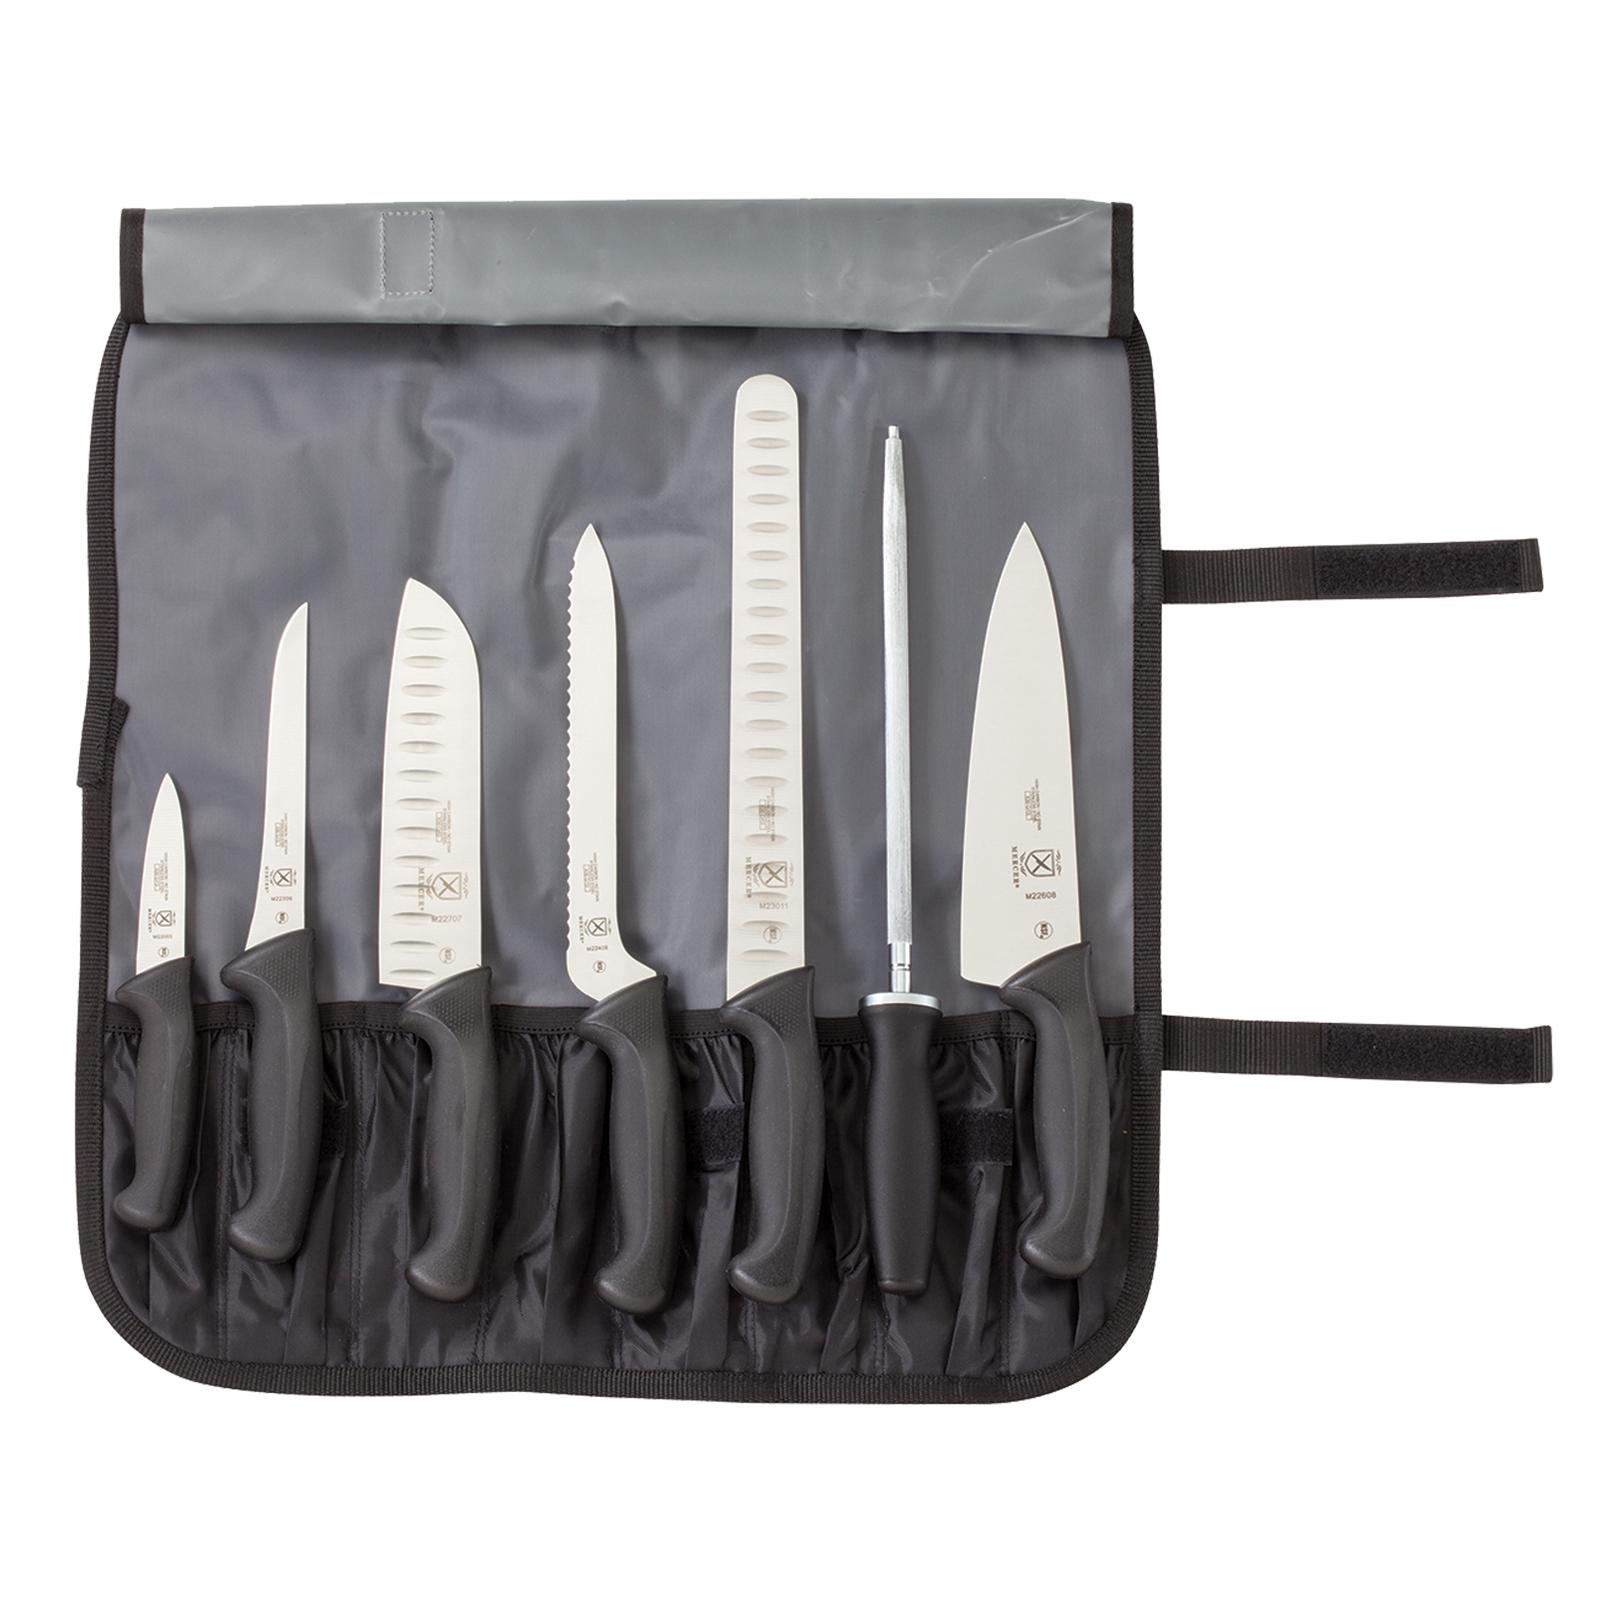 Mercer Culinary M21820 knife set